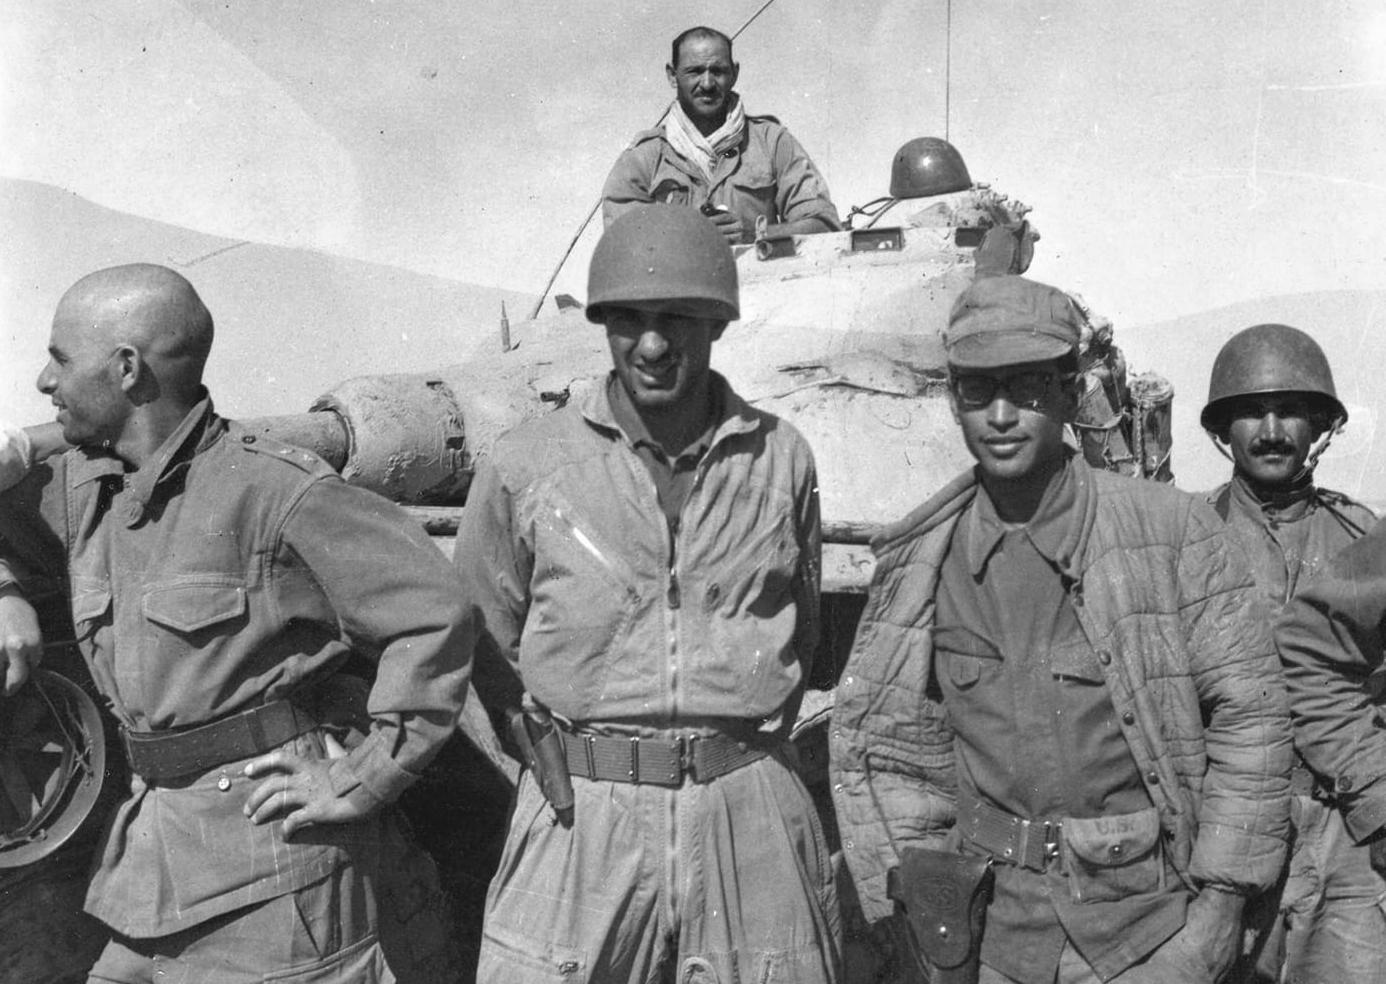 Photos - Guerre des Sables - 1963 - Page 8 46676884774_b0709db482_o